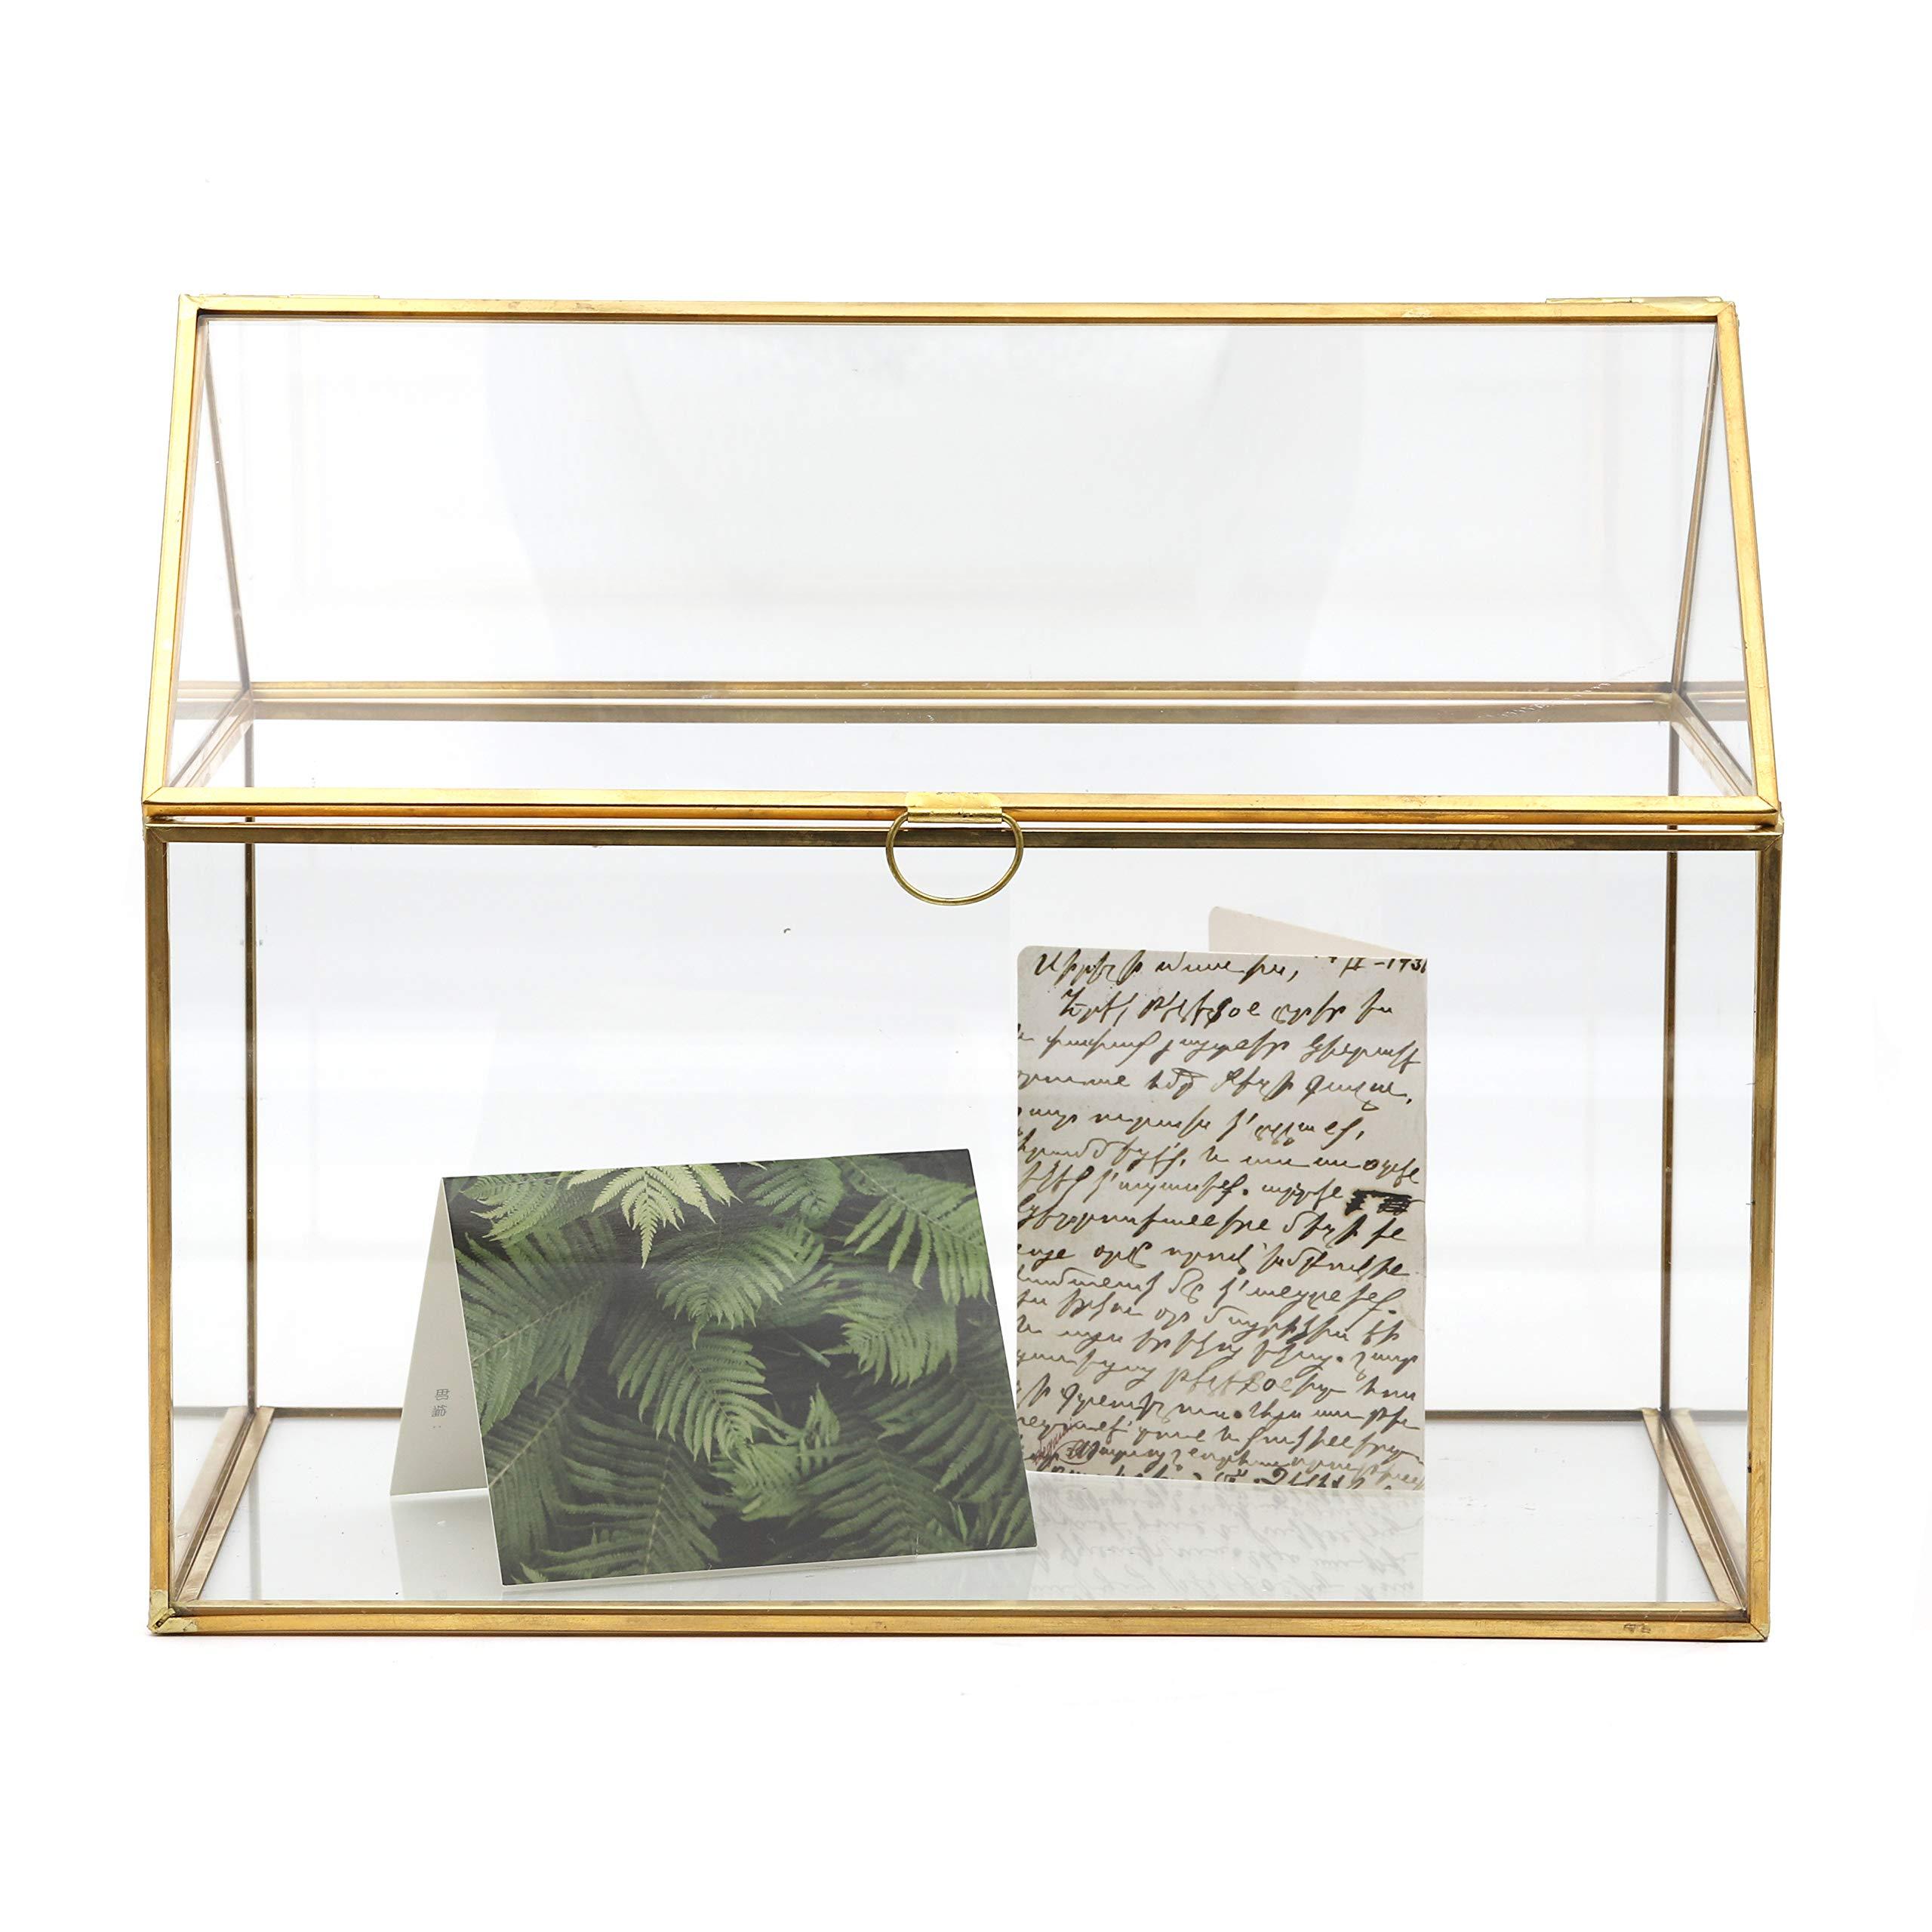 NCYP Large Inches Geometric Glass Decor Card Box Terrarium Centerpiece Tabletop Planter Handmade Copper House Shape Flower Pot for Plants Succulents (10.2'' X 8.3'' X 6.3'' )